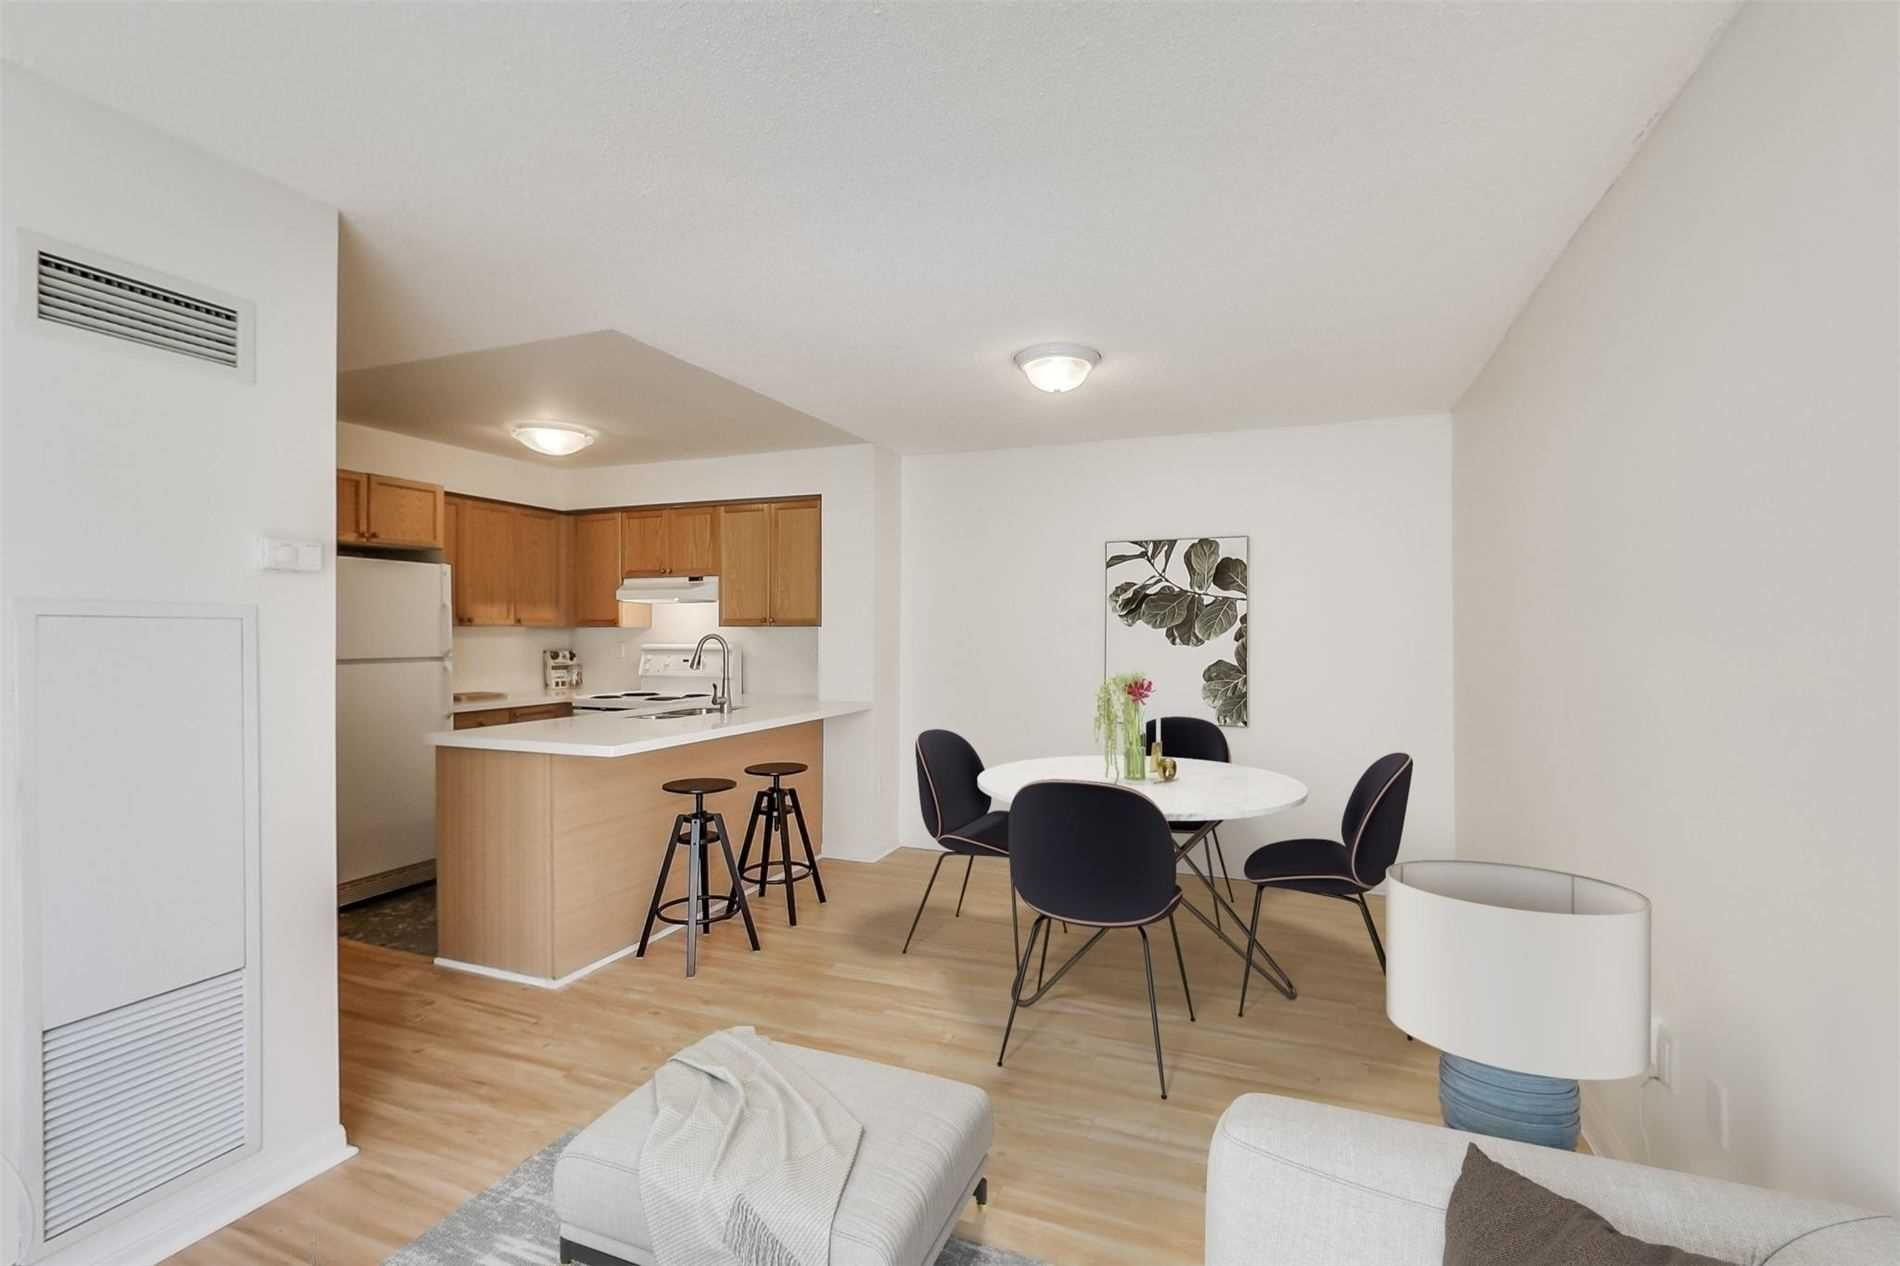 Photo 8: Photos: 808 109 E Front Street in Toronto: Moss Park Condo for lease (Toronto C08)  : MLS®# C4816382